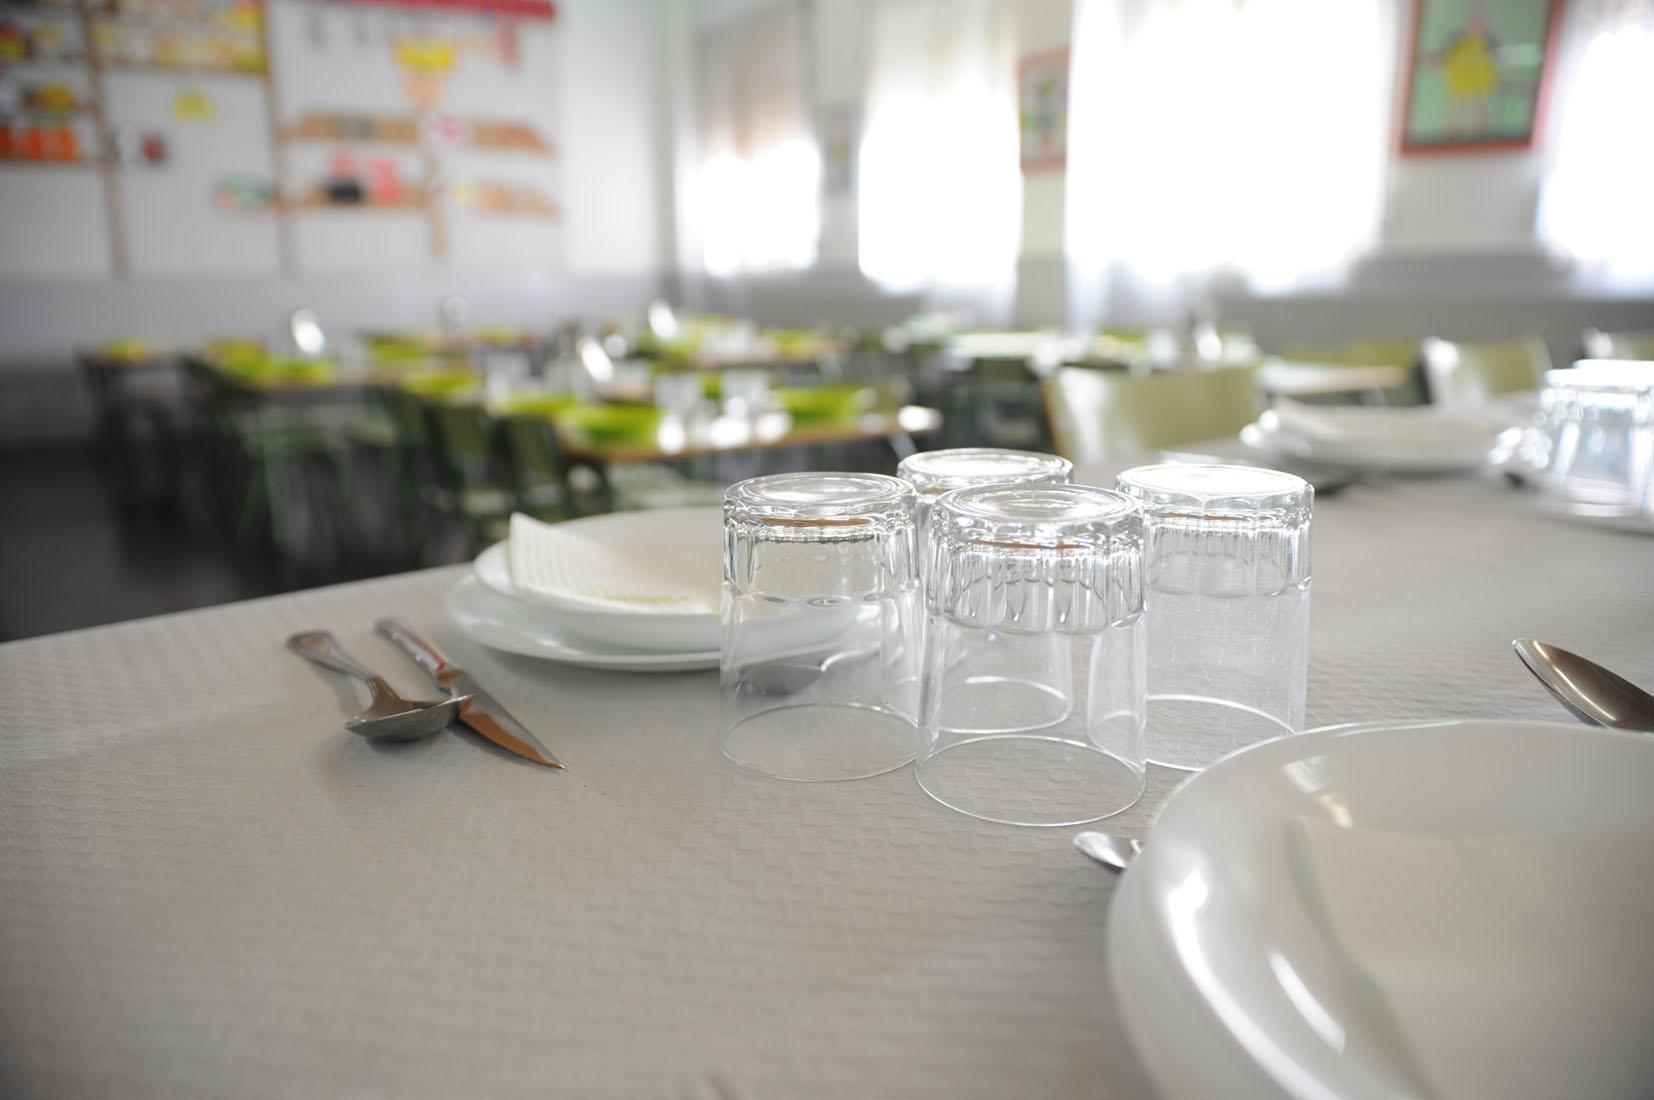 Fuenlabrada habr ayudas a comedor para casi ni os for Ayudas para comedor escolar